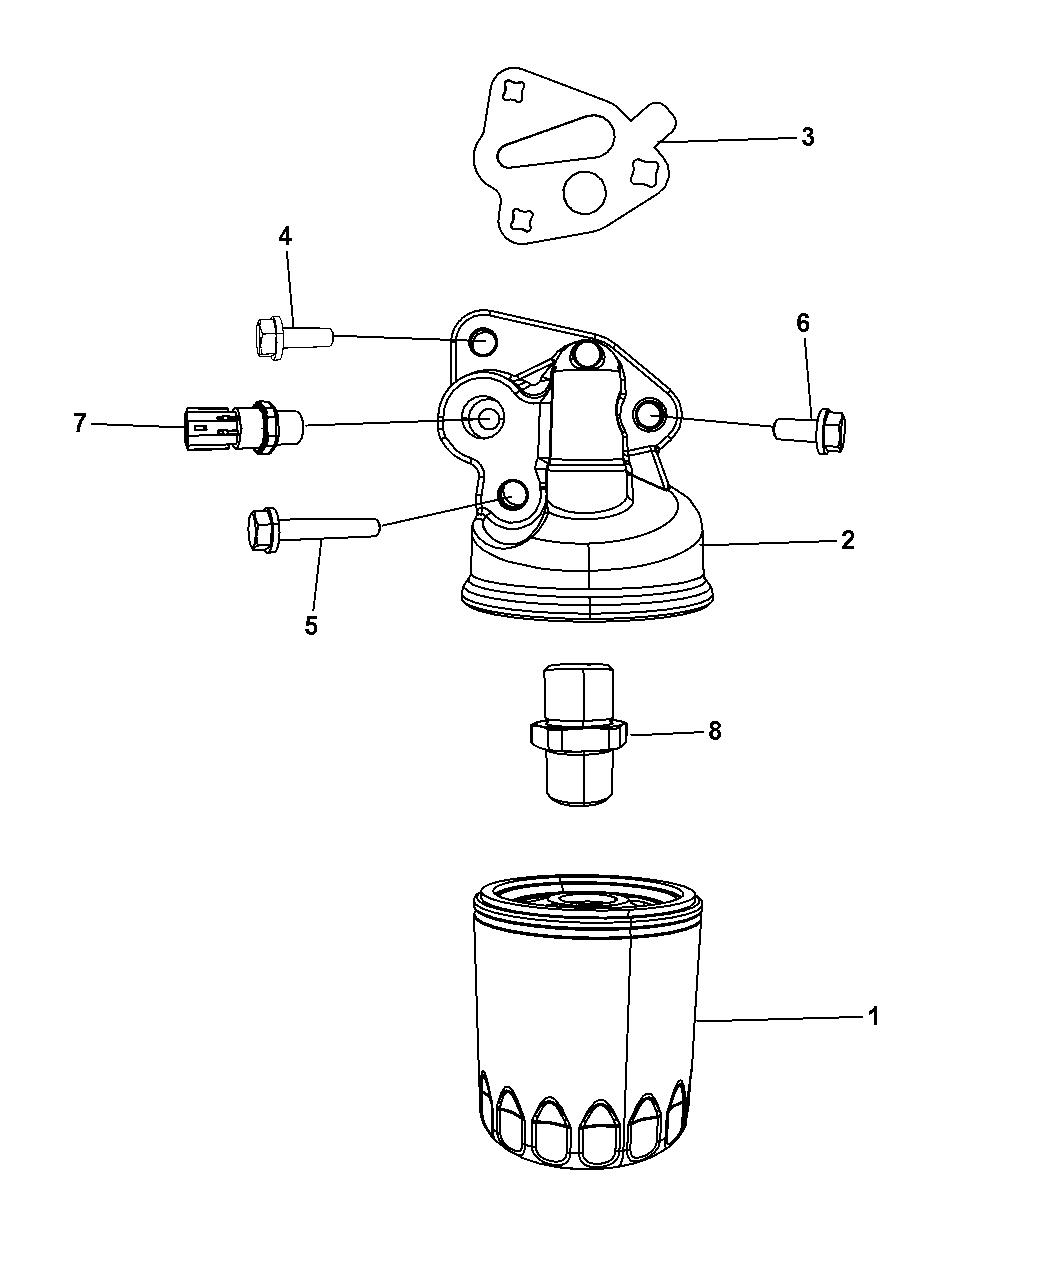 2008 Chrysler Pacifica Engine Oil Filter, Adapter & Splash Guard -  Thumbnail 1